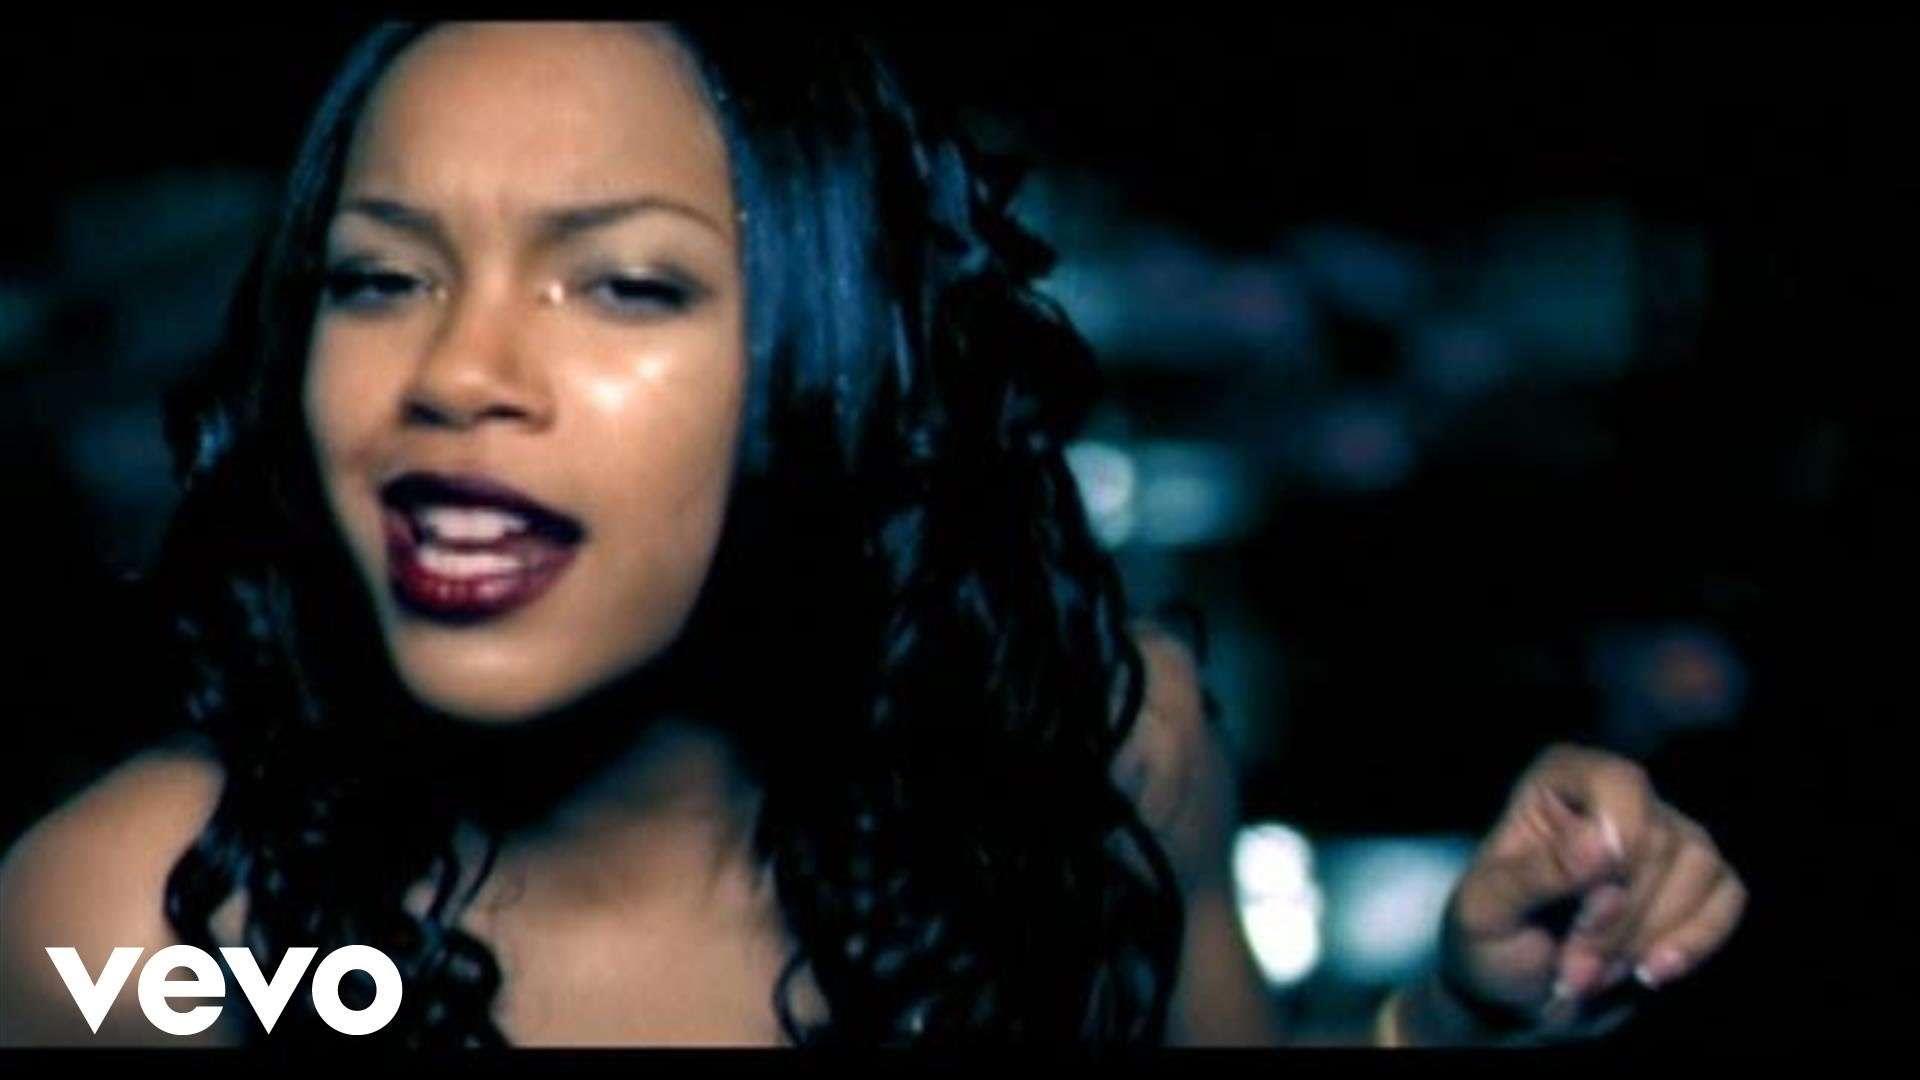 Cha Cha - New Millenium (What Cha Wanna Do) - YouTube